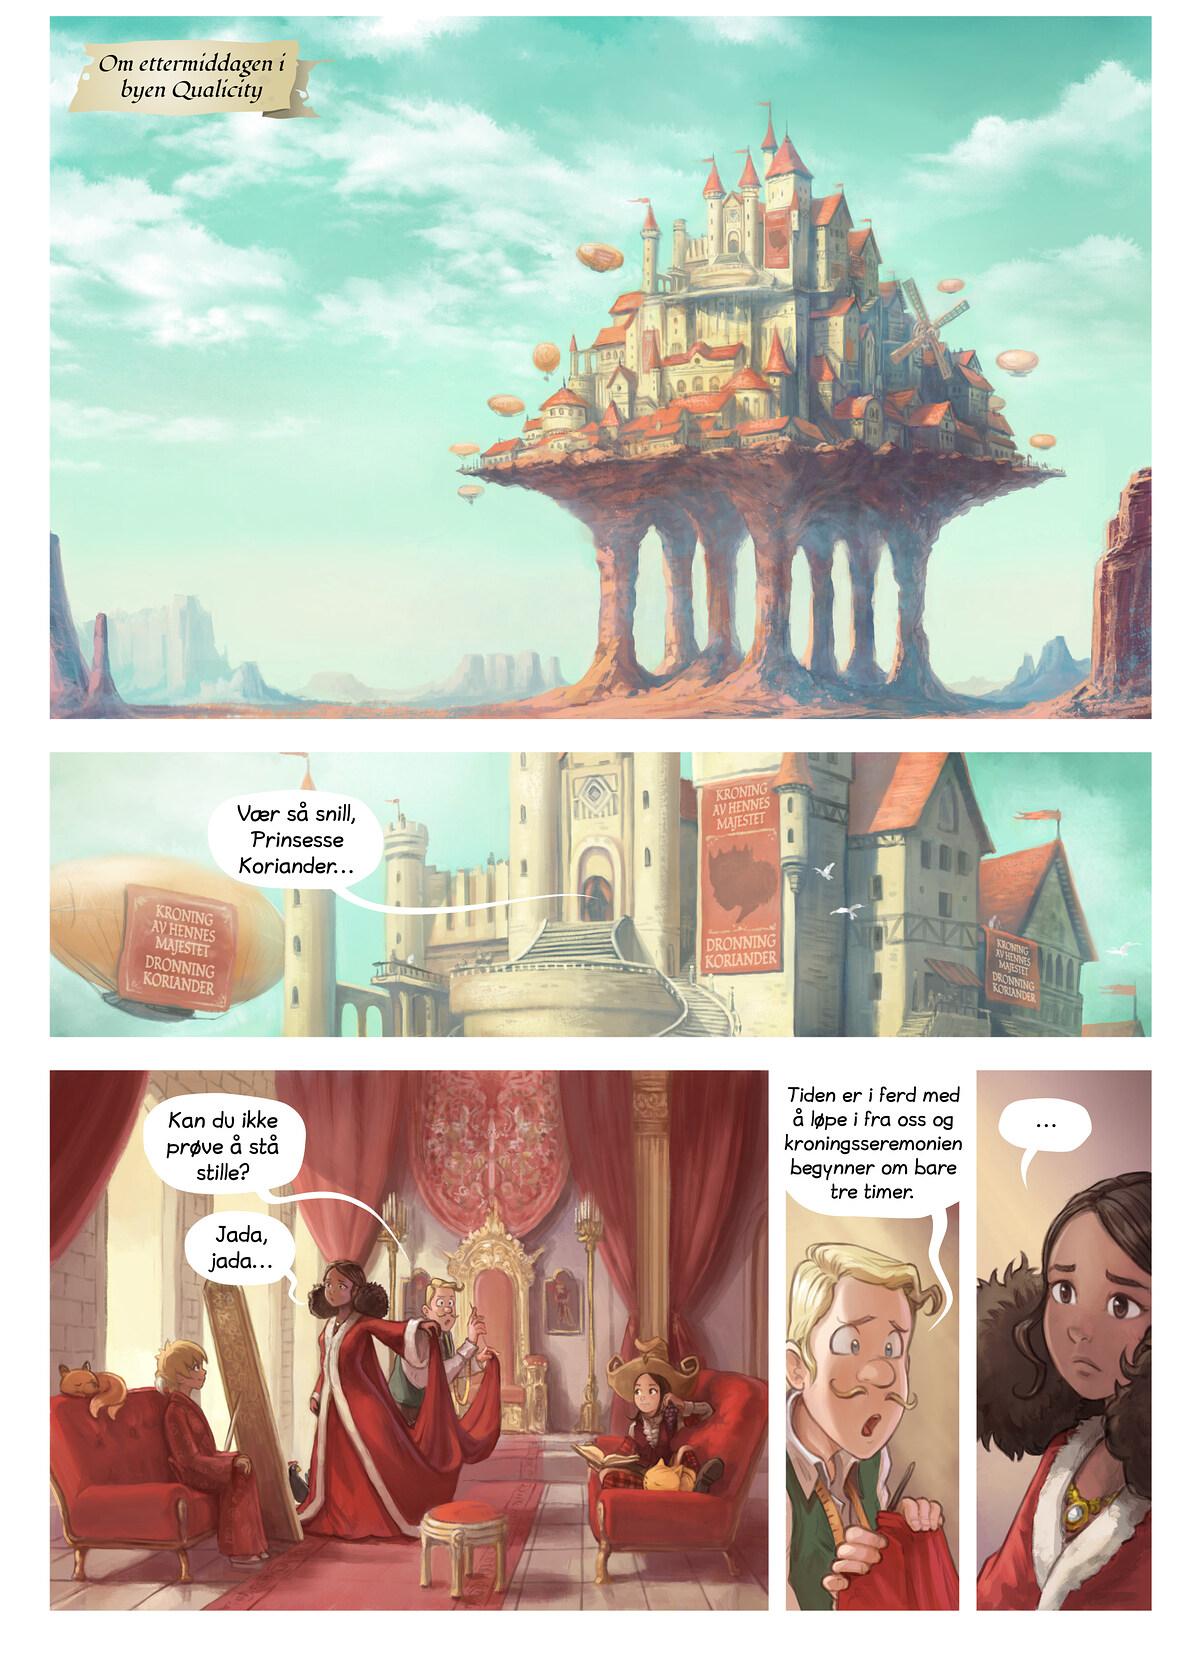 Episode 27: Korianders oppfinnelse, Page 1